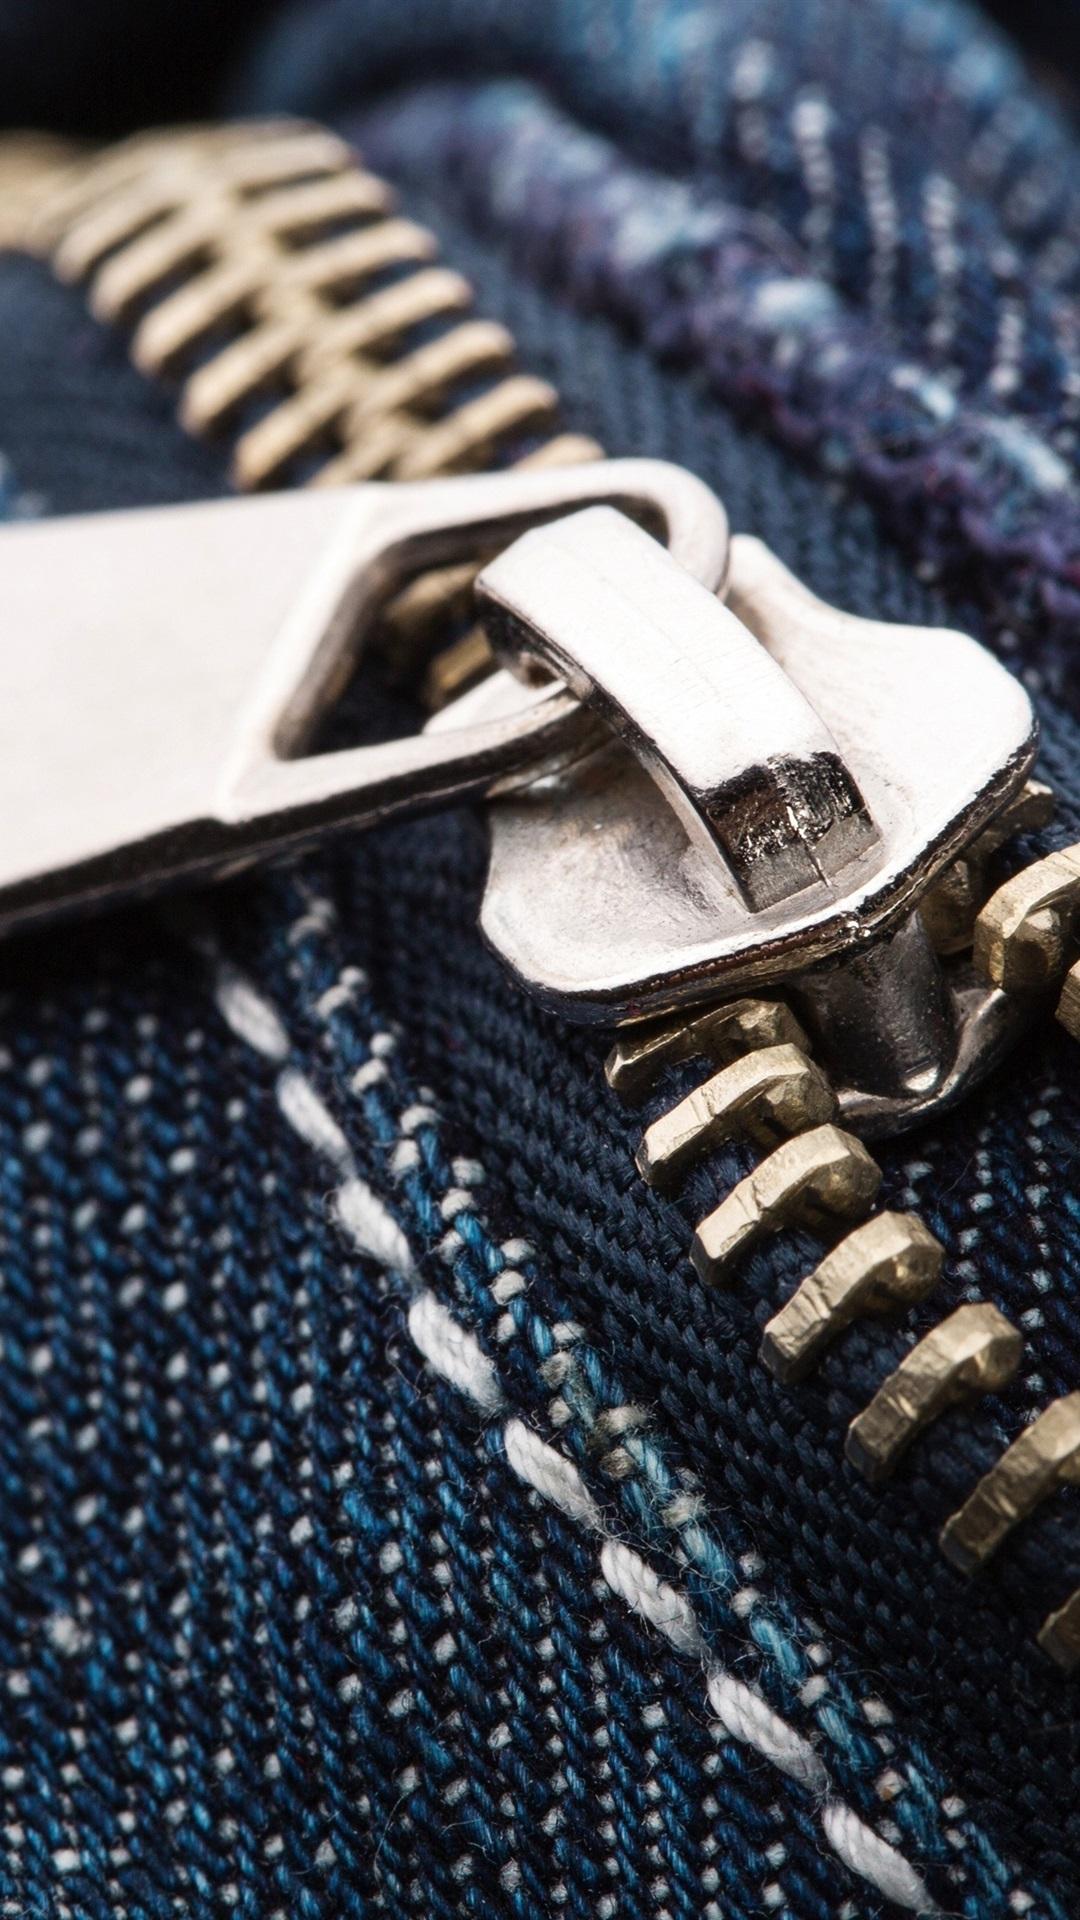 Jeans, metal zipper 1080x1920 iPhone 8